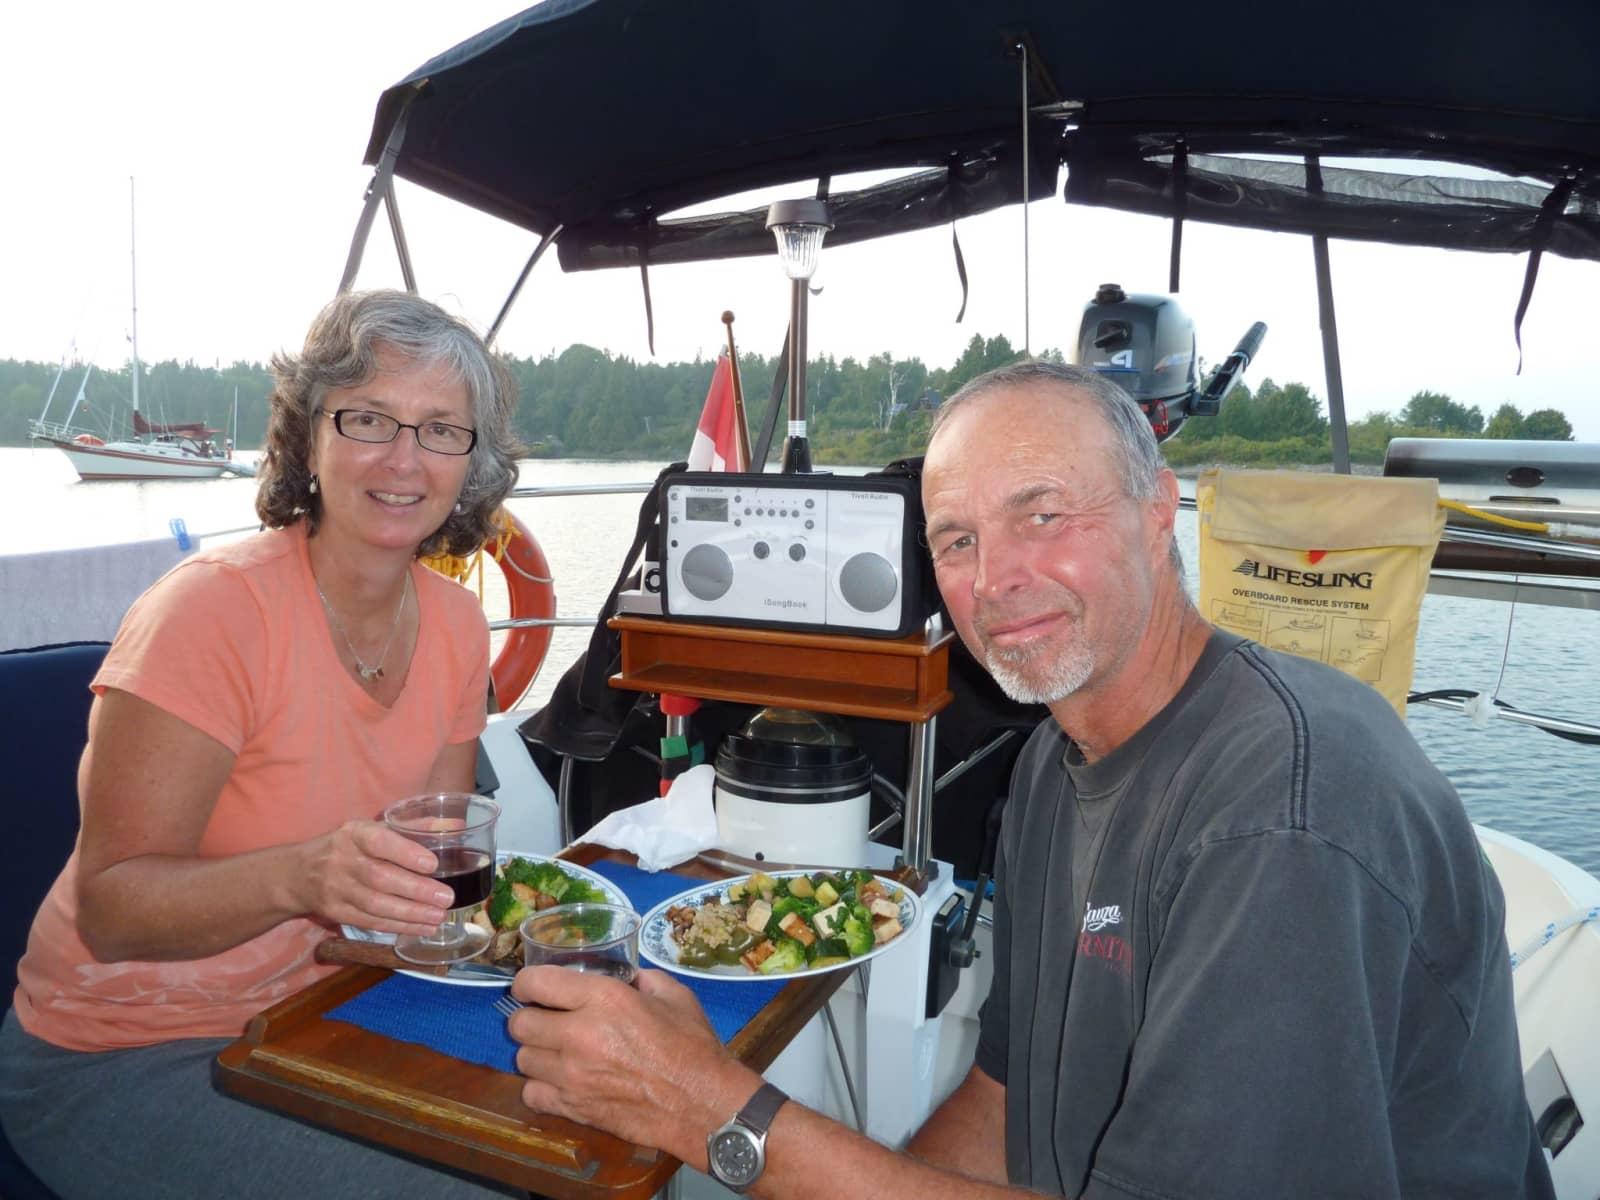 Rob & Jan from Owen Sound, Ontario, Canada